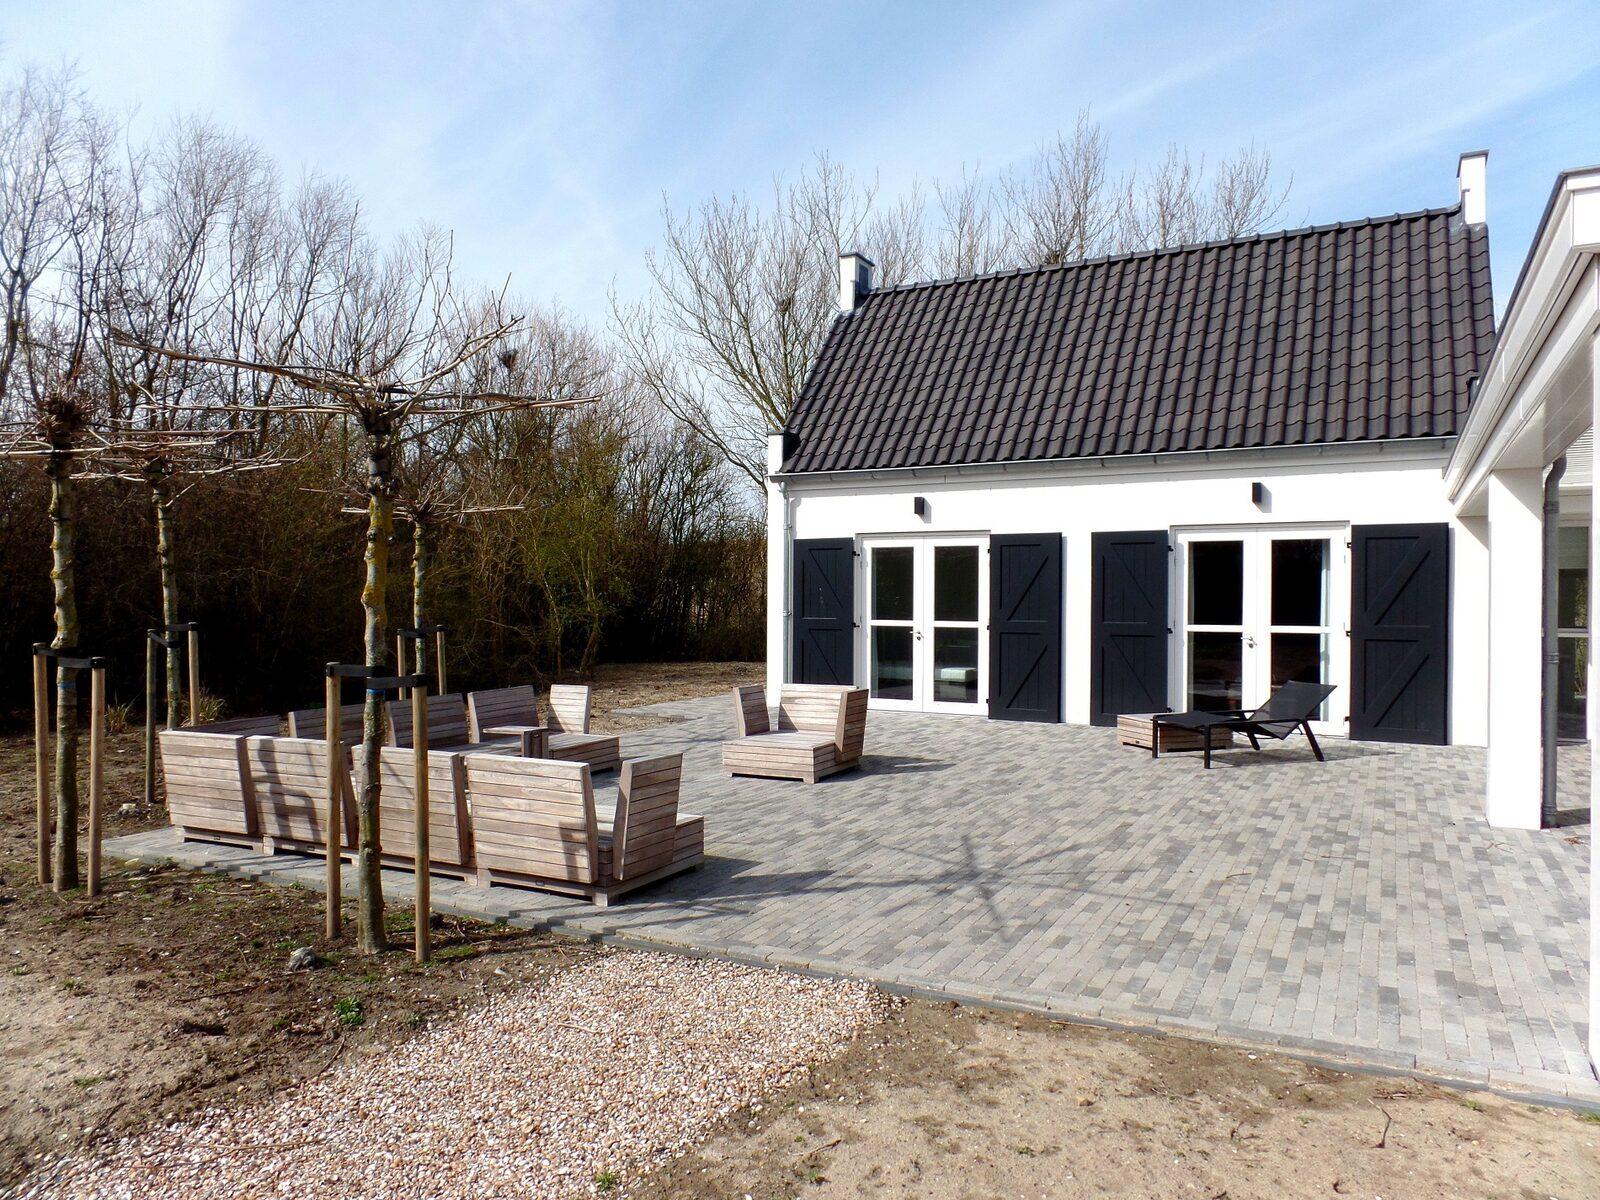 Westerweg 23 - Ouddorp